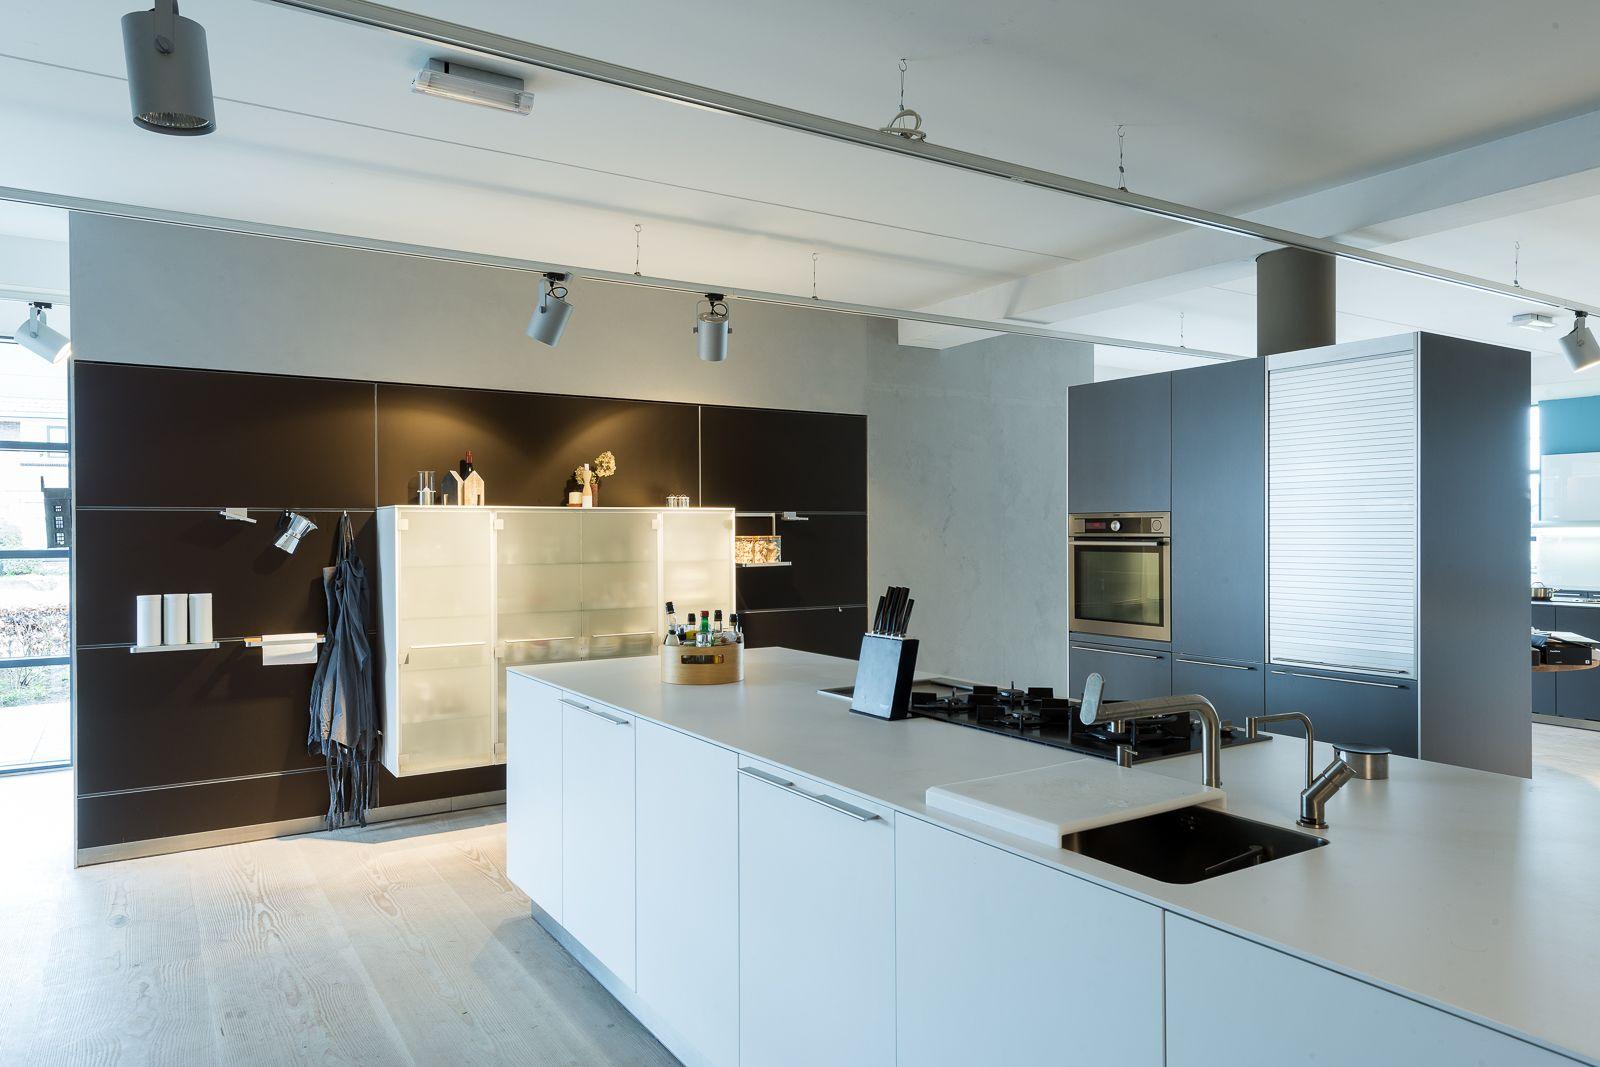 bulthaup b3 44162. Black Bedroom Furniture Sets. Home Design Ideas